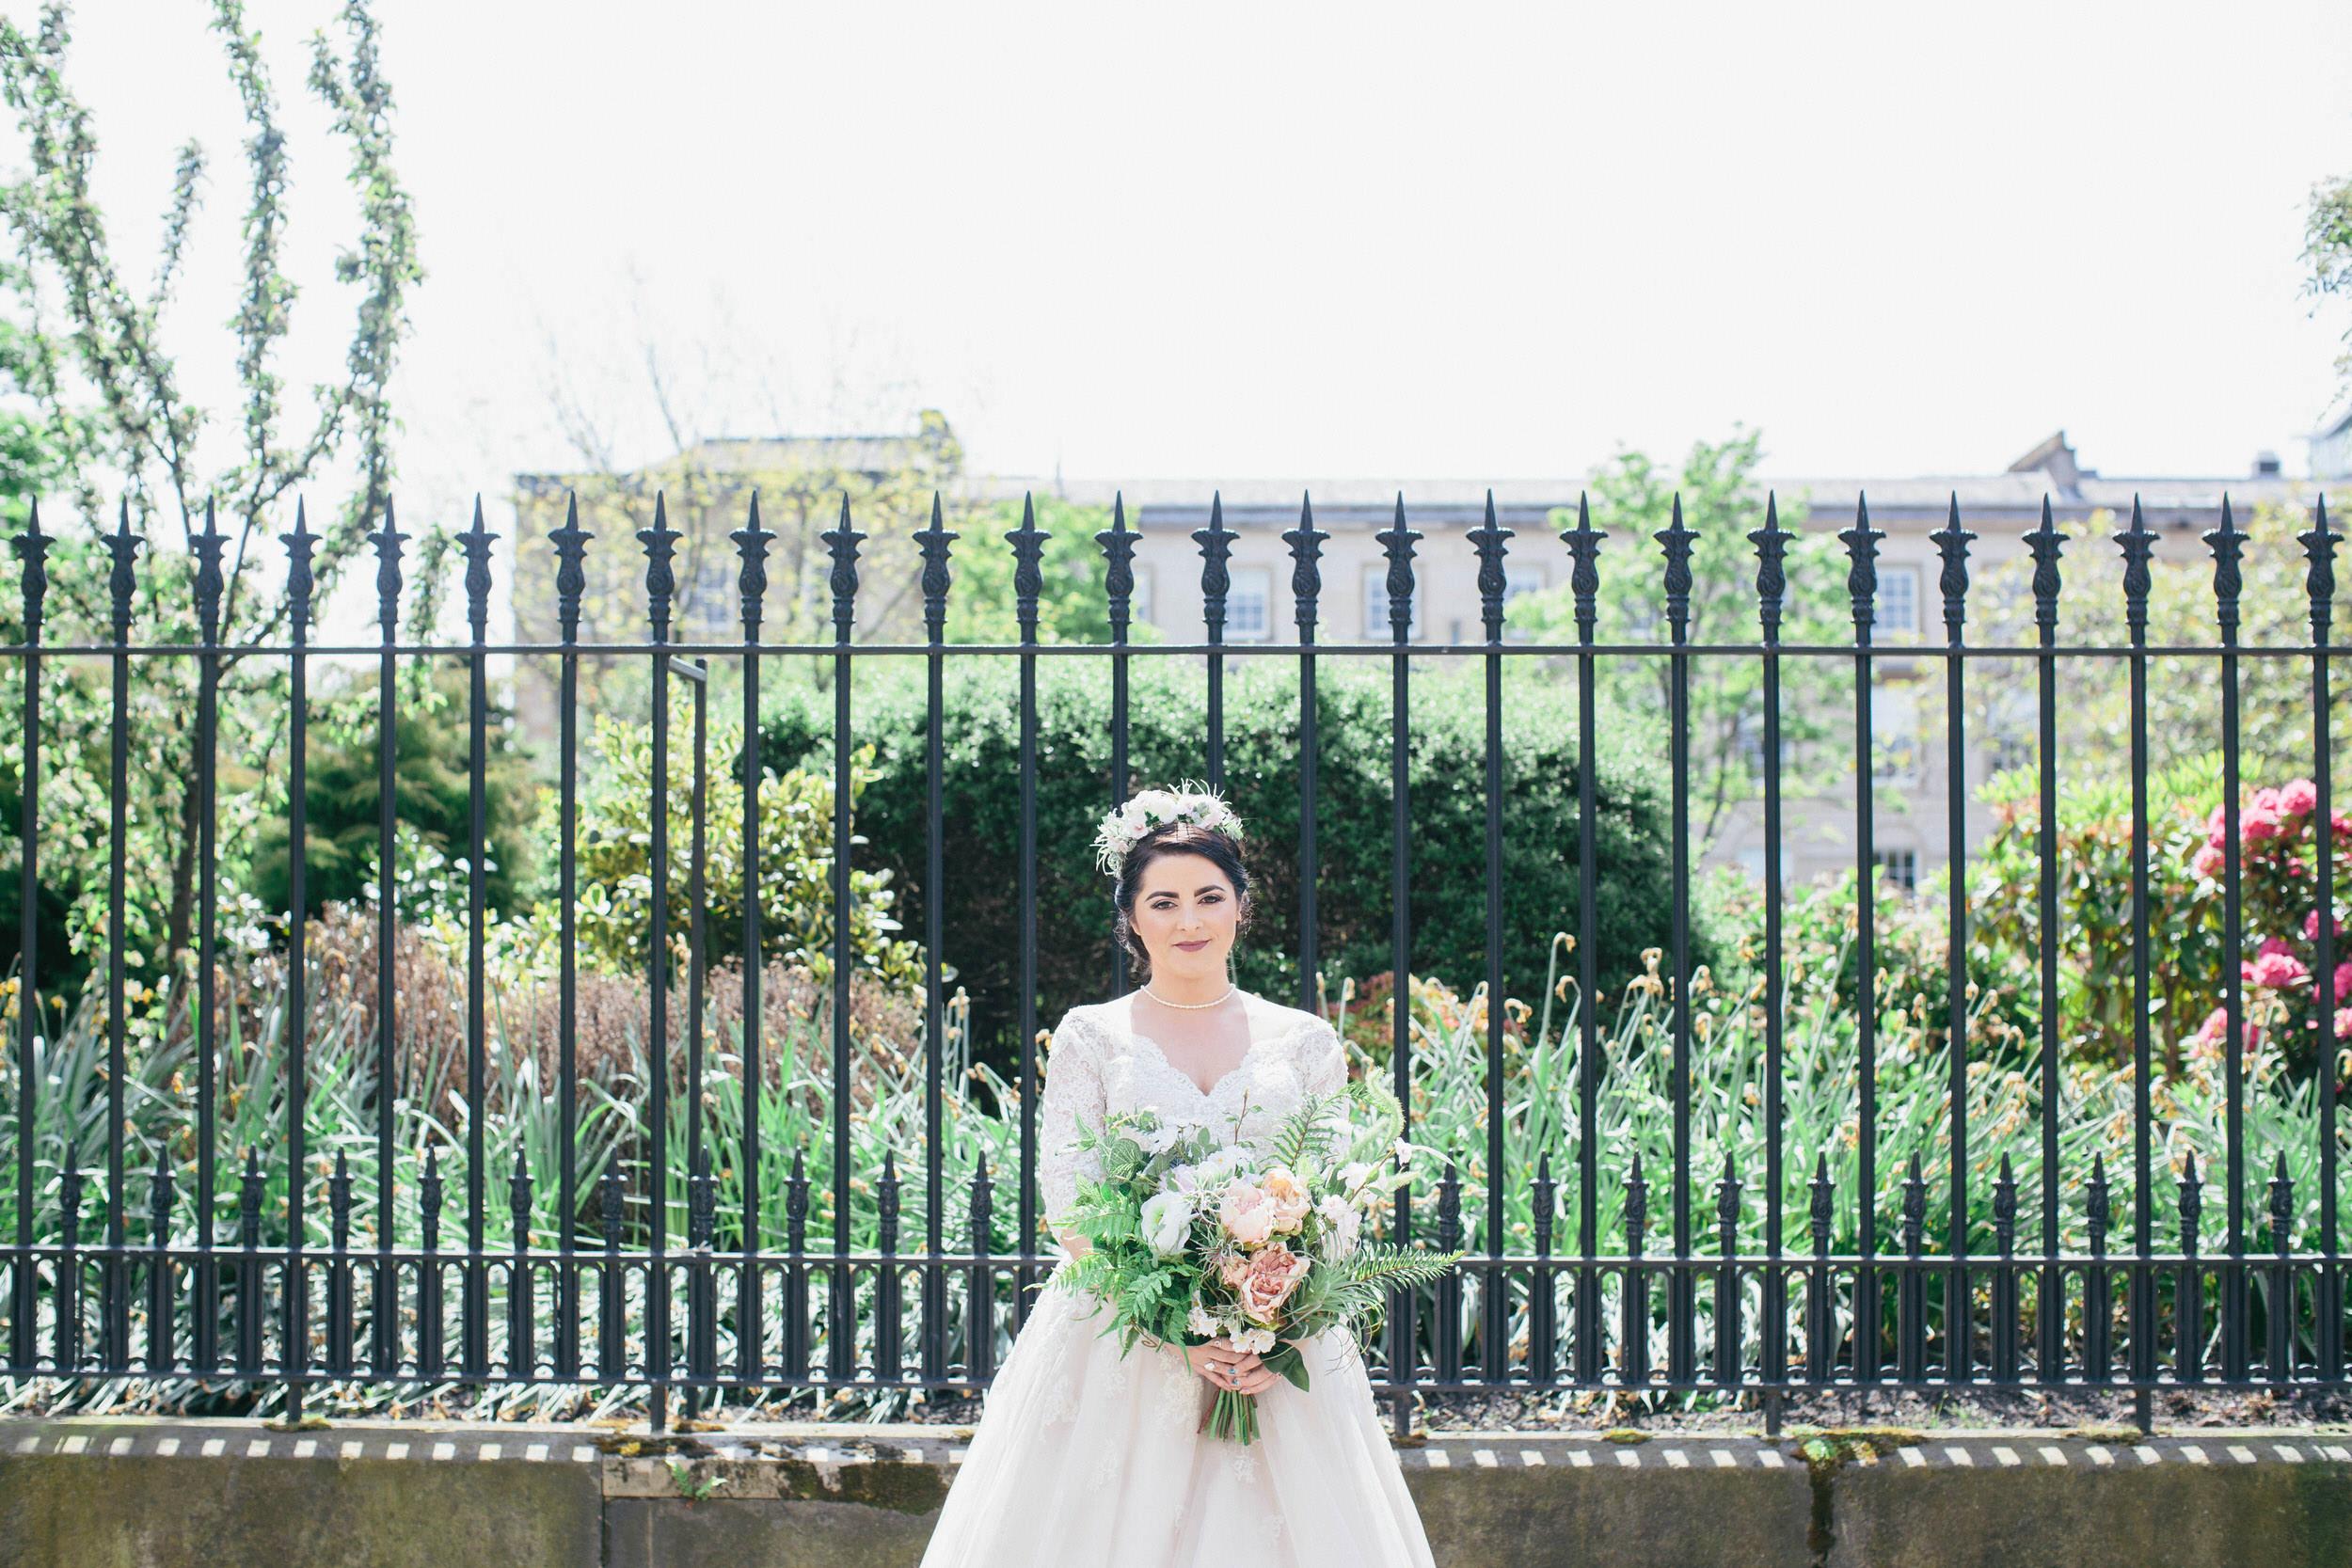 Quirky Wedding Photographer Scotland Glasgow Edinburgh Mirrorbox 046.jpg